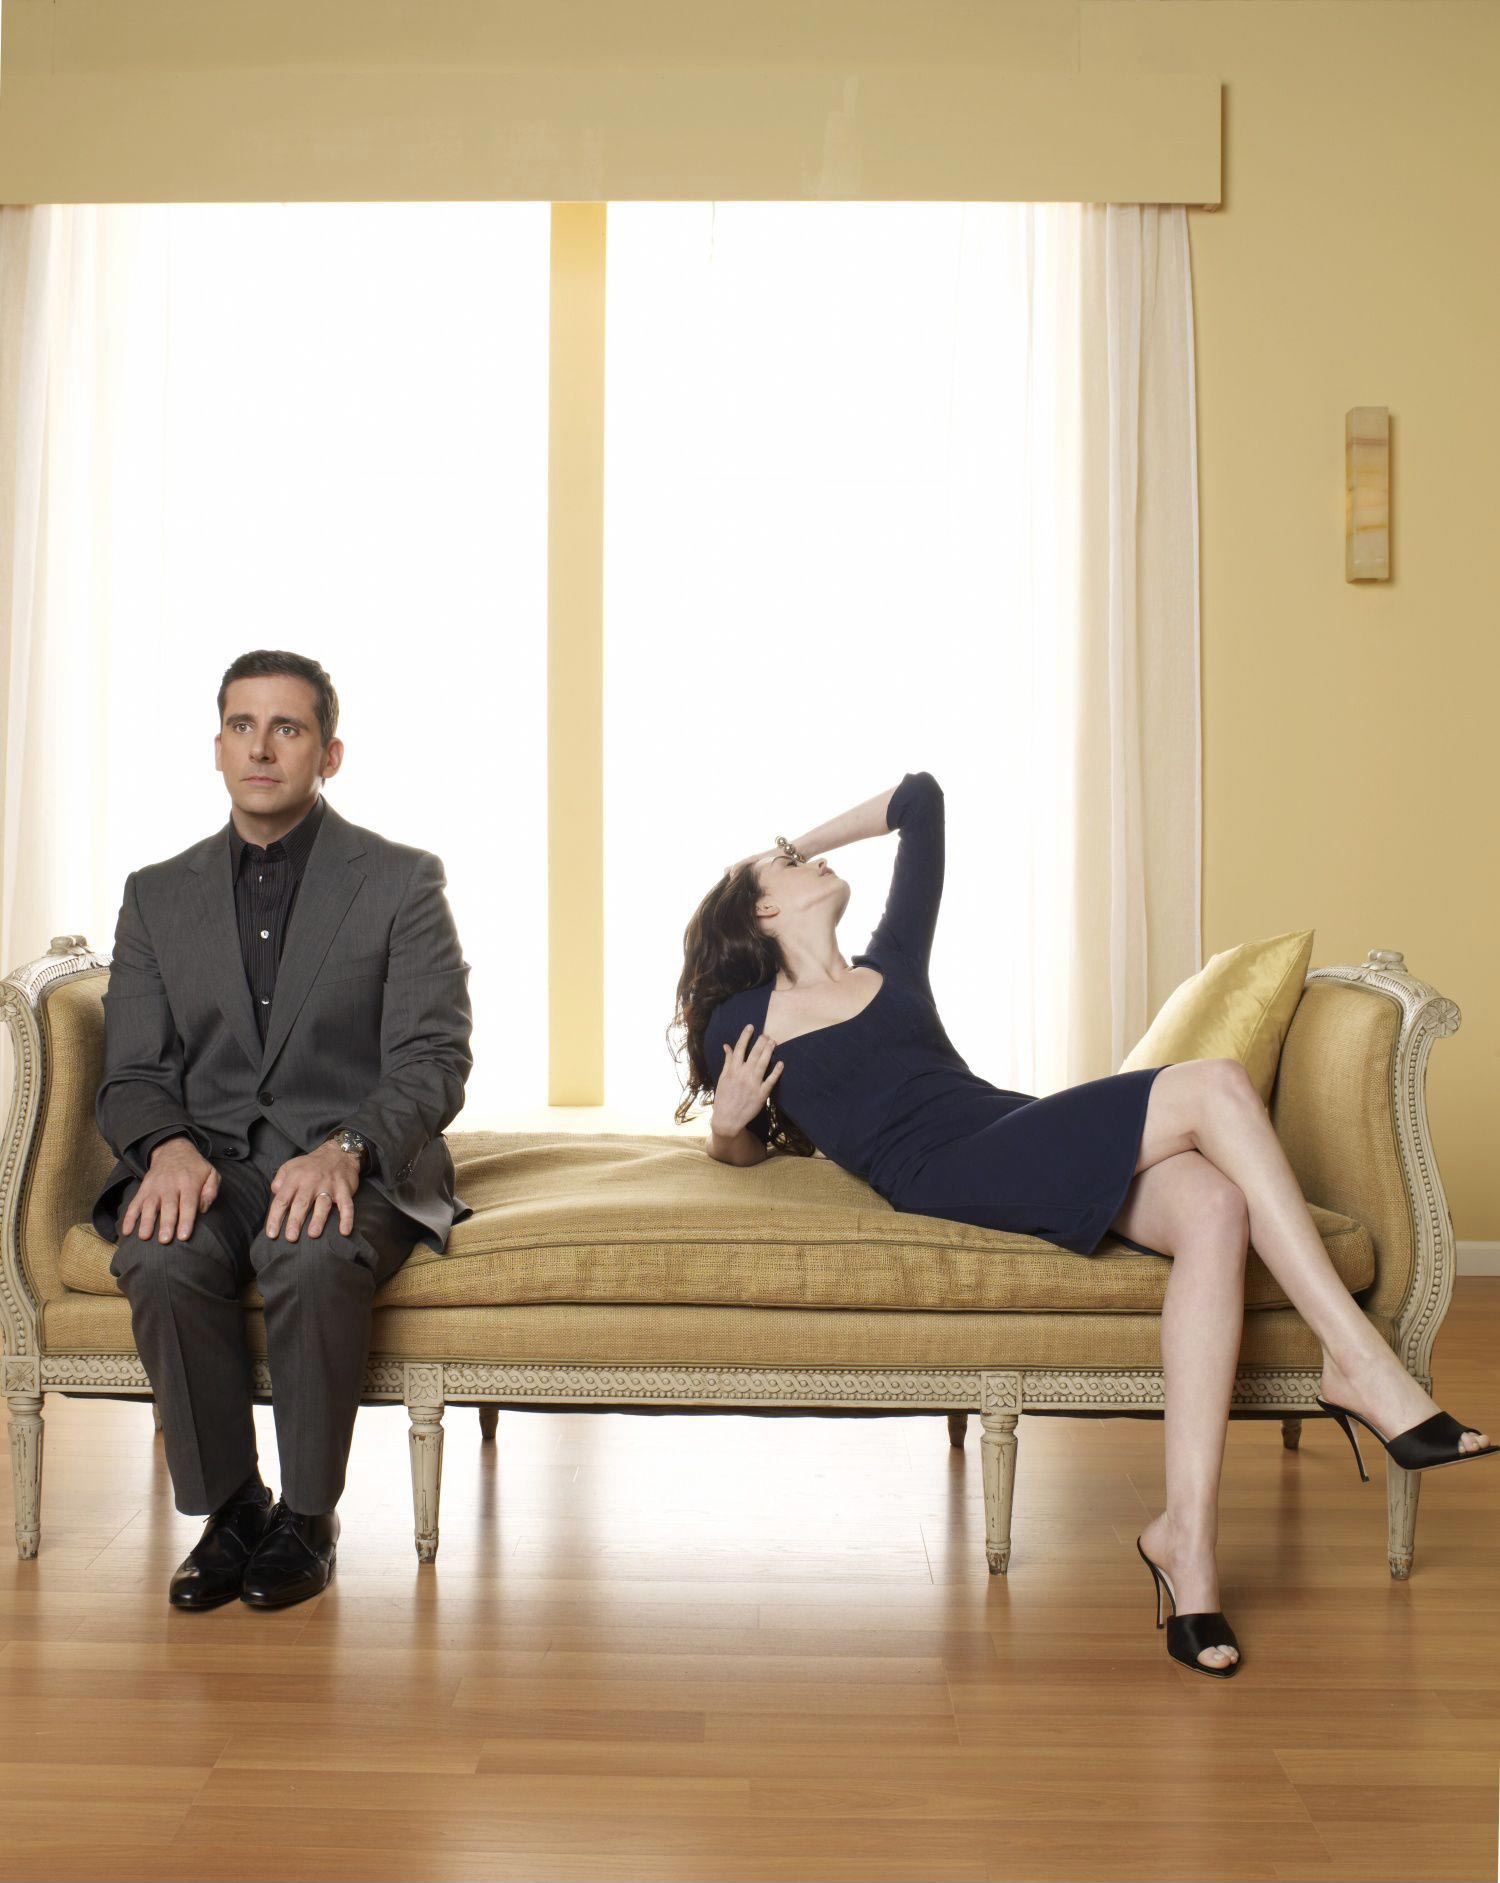 Anne Hathaway Leggy In High Heels Get Smart Photoshoot